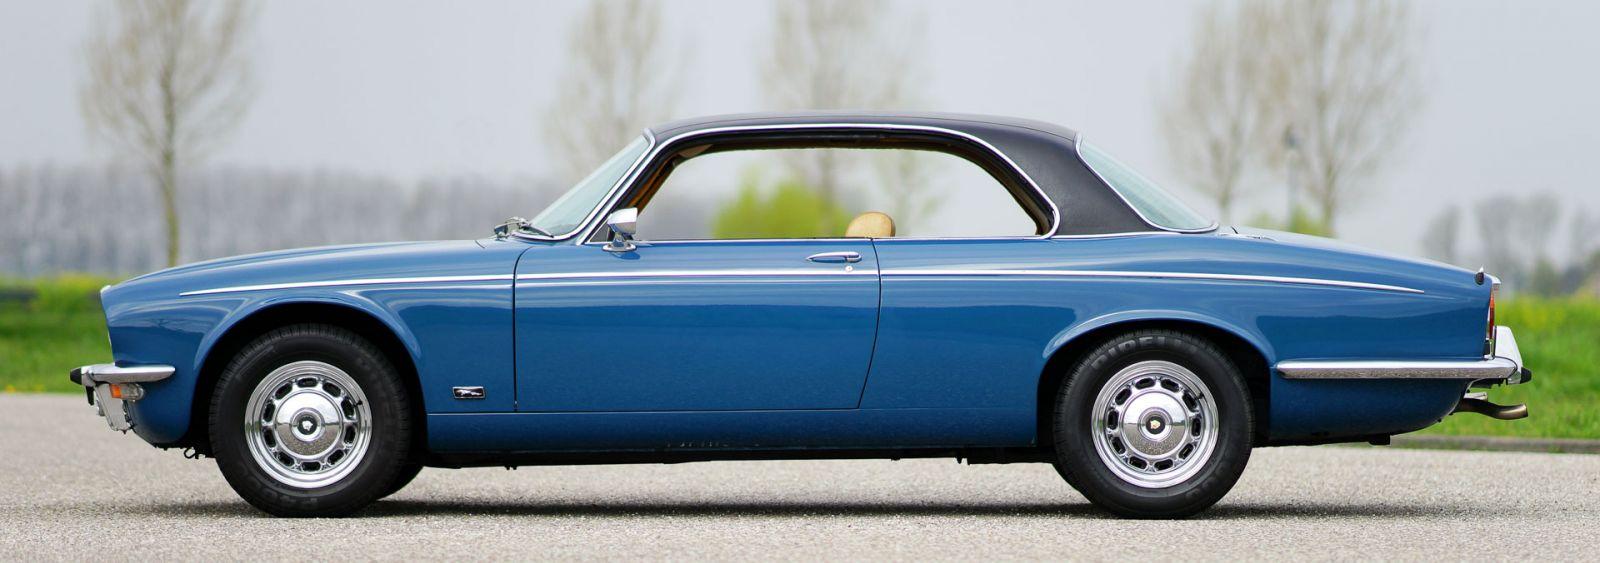 jaguar xj6 coupe 1978 welcome to classicargarage. Black Bedroom Furniture Sets. Home Design Ideas